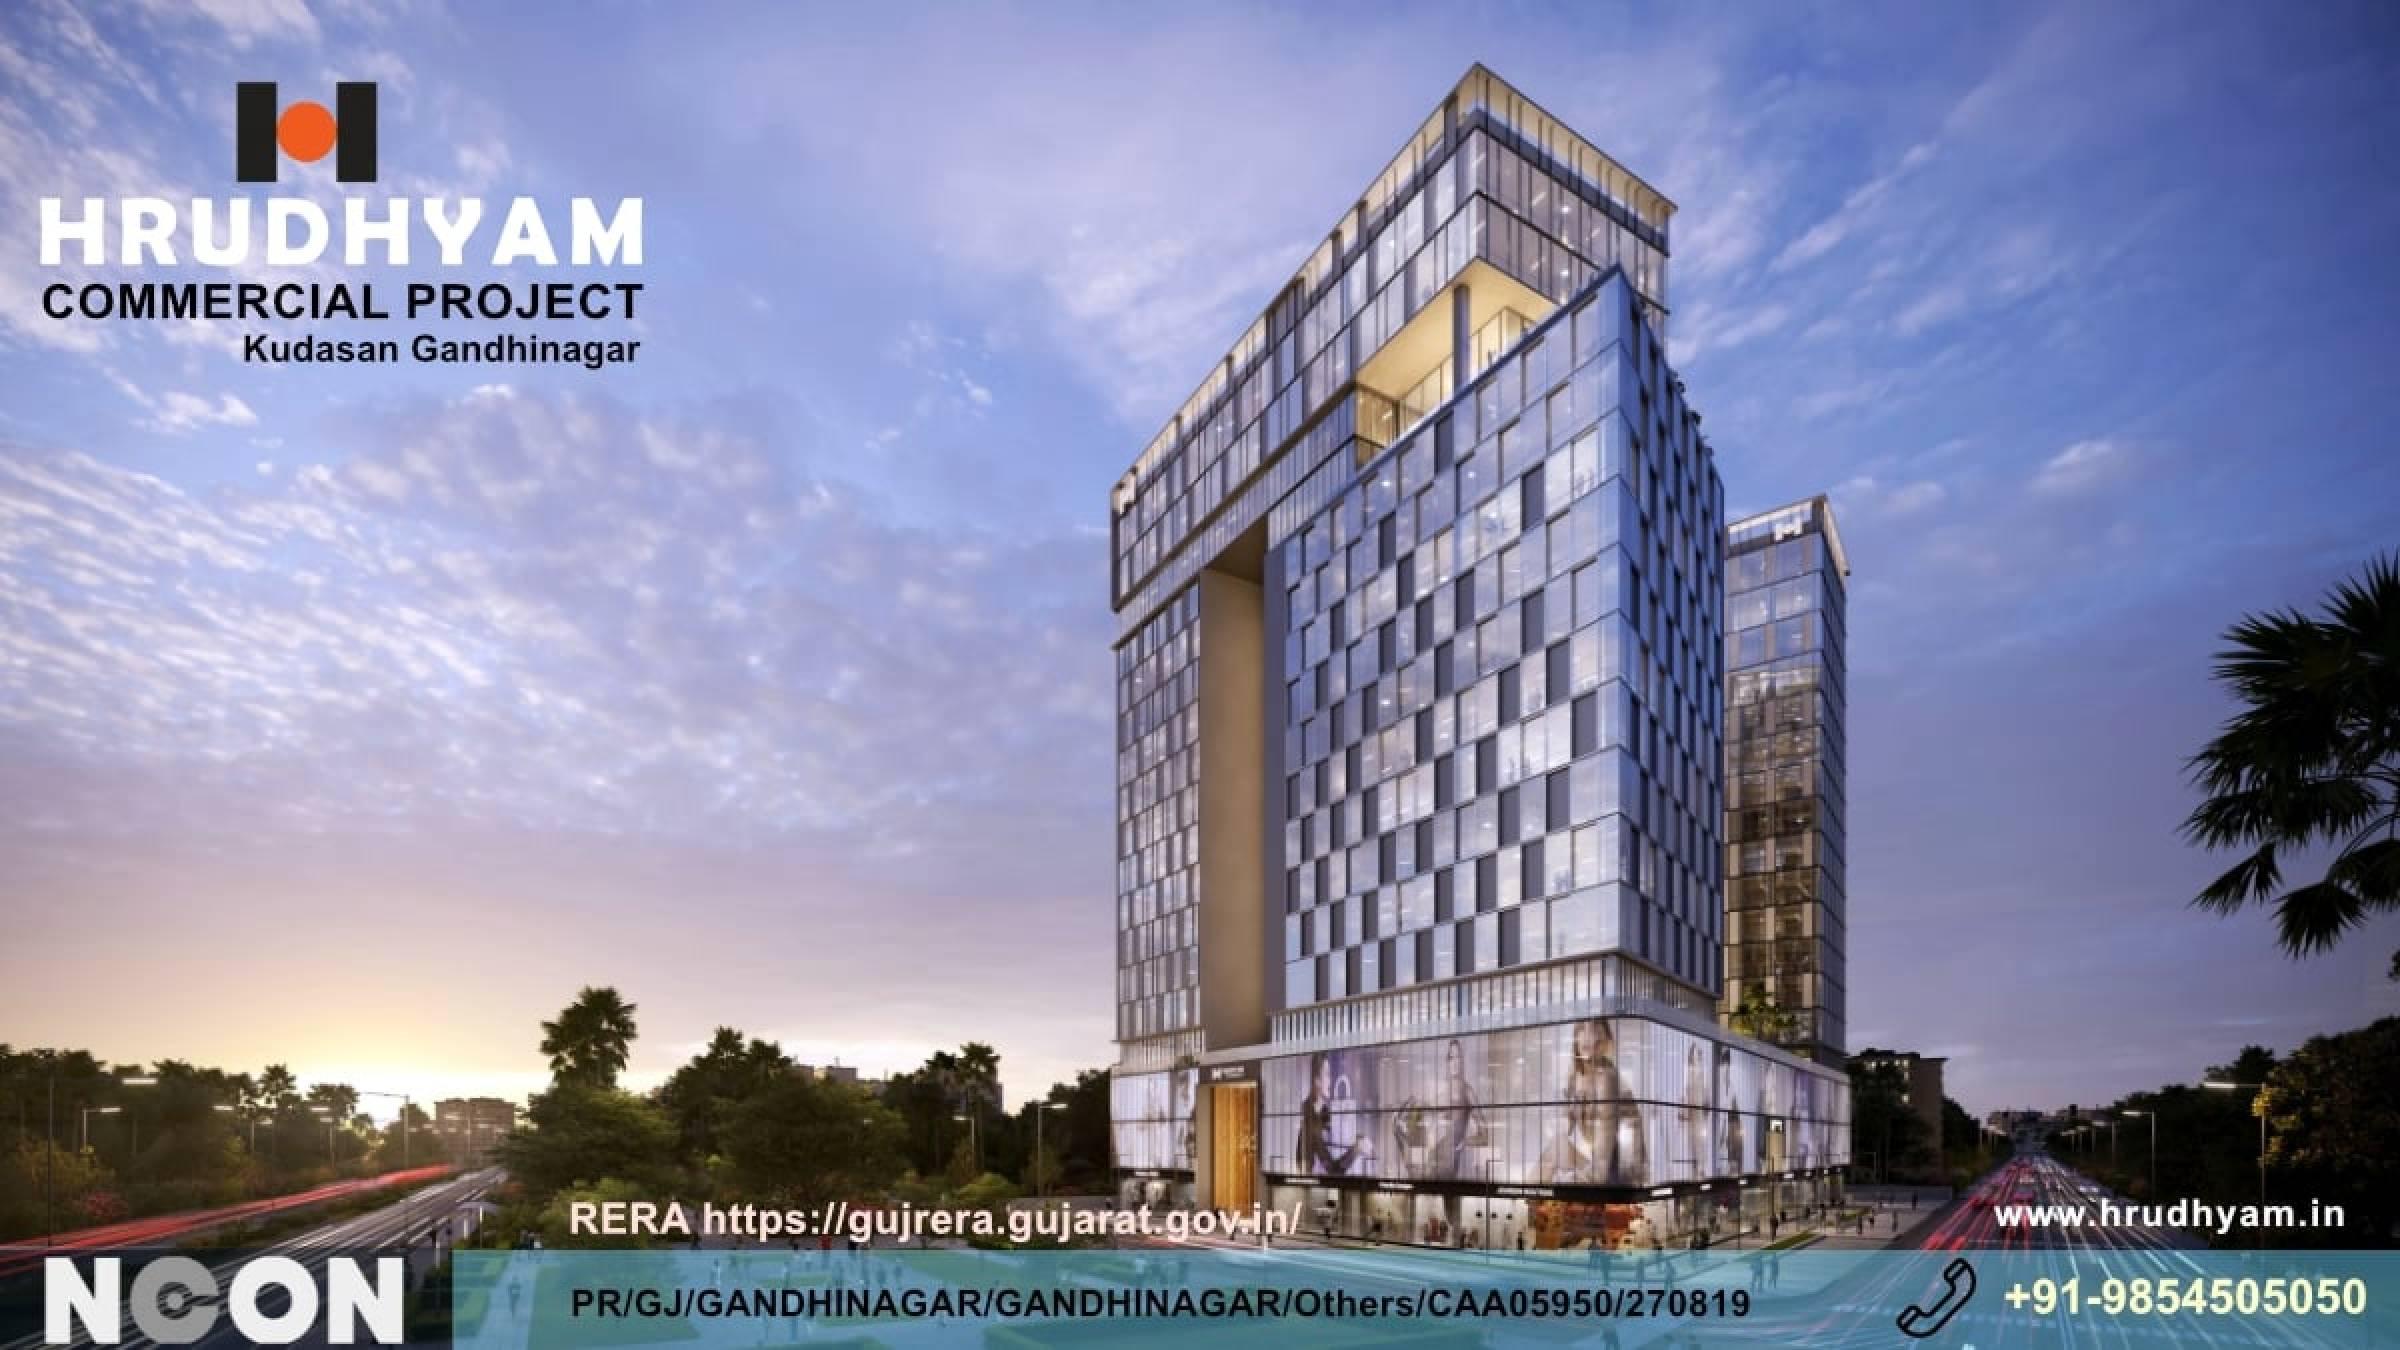 Buy Commercial Property in Gandhinagar, Kudasan, Gujarat | Hrudhyam.in